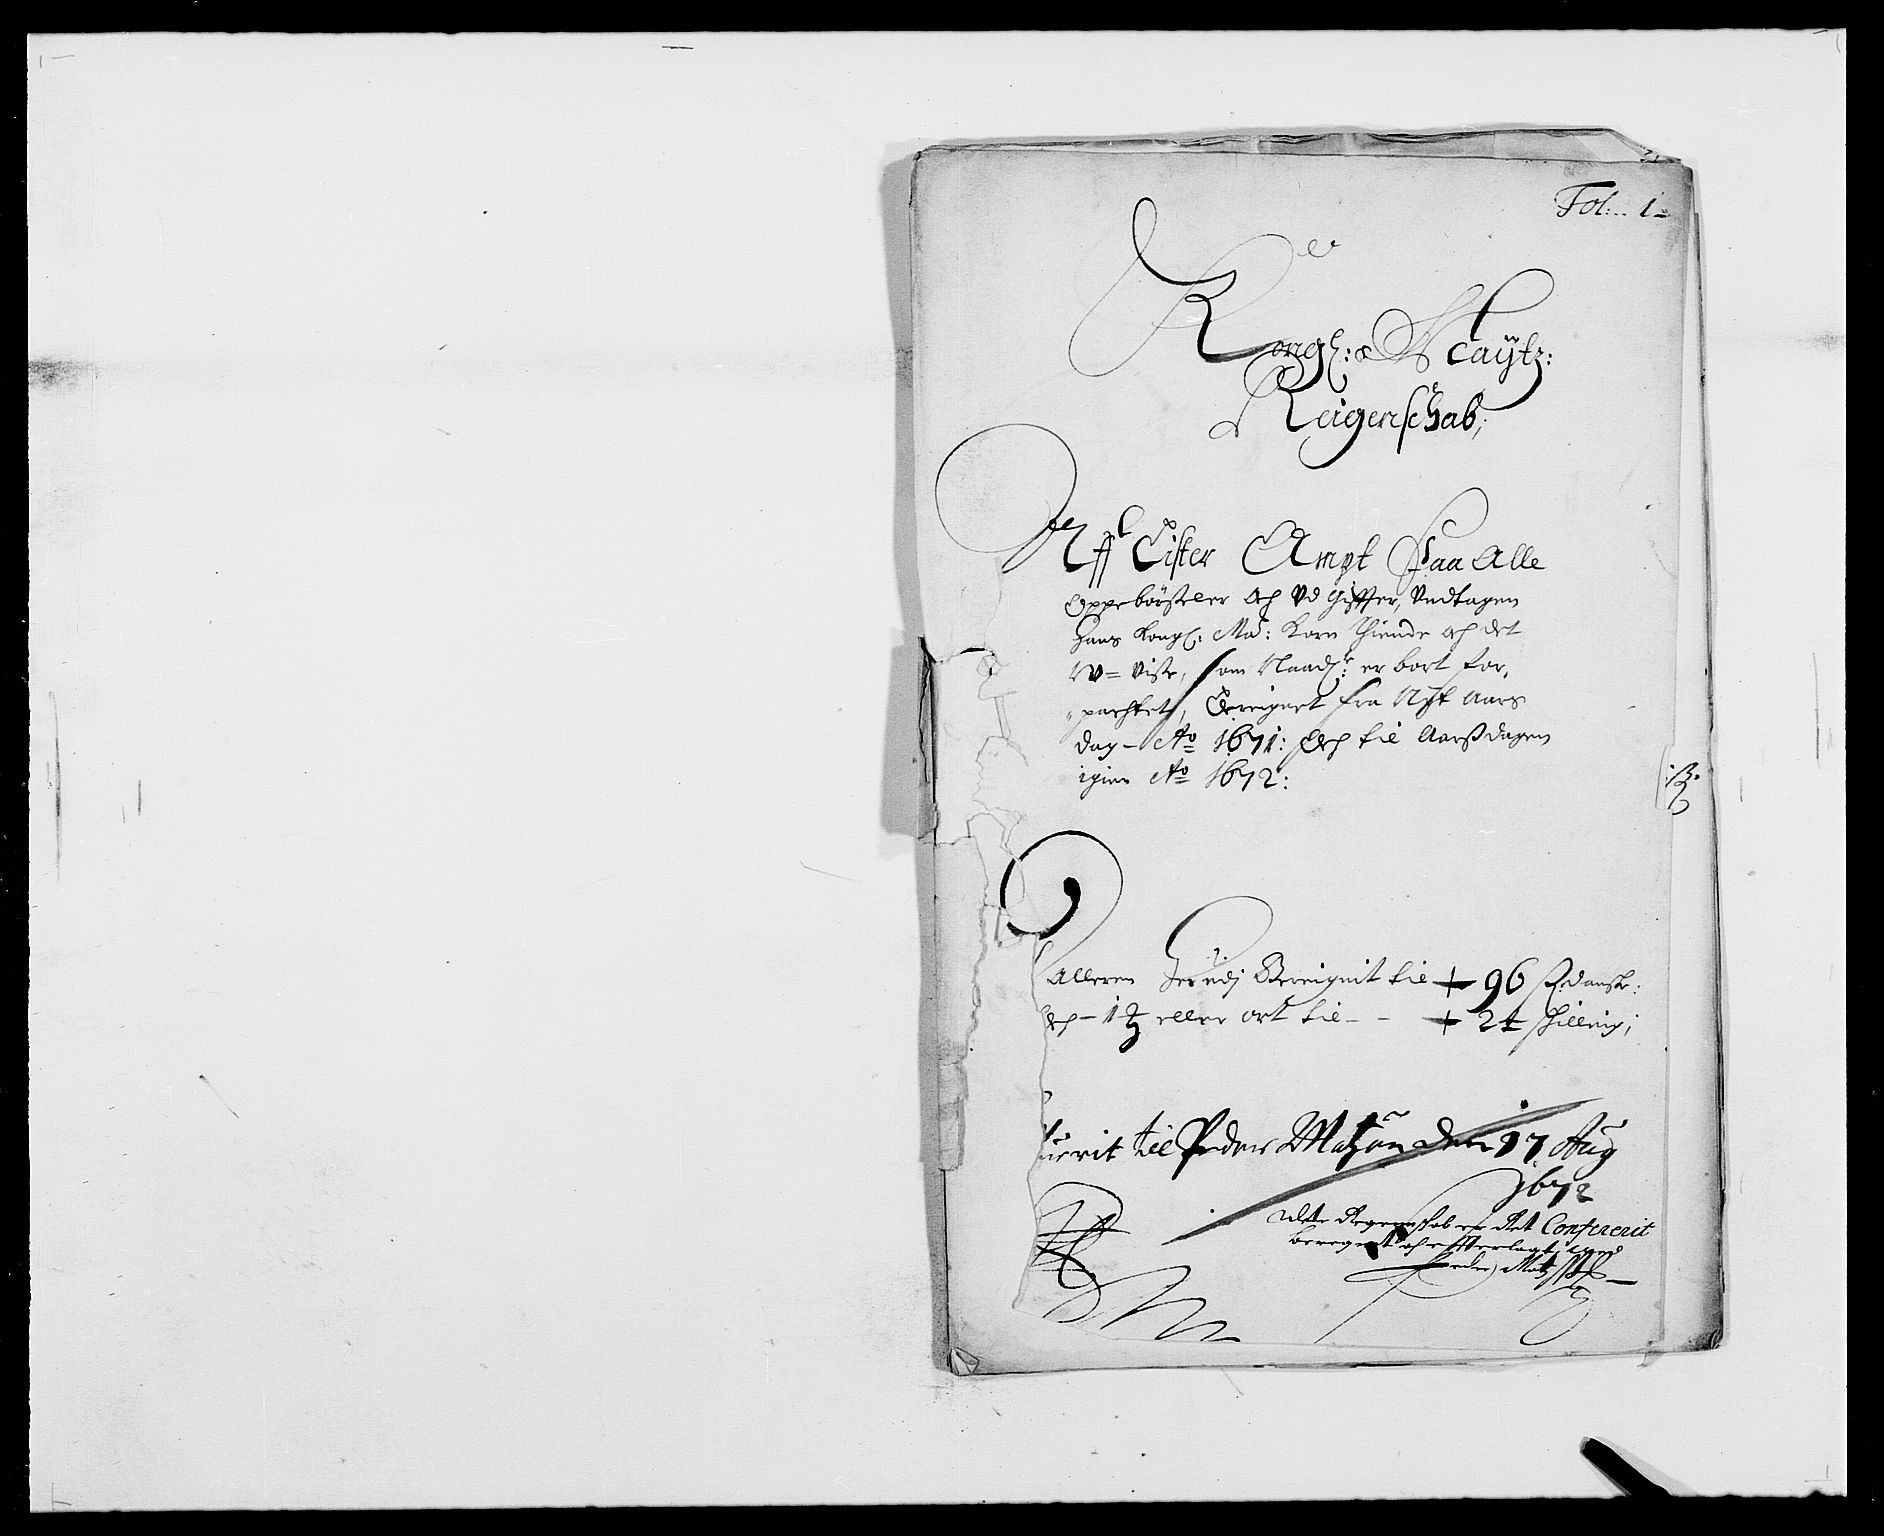 RA, Rentekammeret inntil 1814, Reviderte regnskaper, Fogderegnskap, R41/L2525: Fogderegnskap Lista, 1669-1671, s. 145